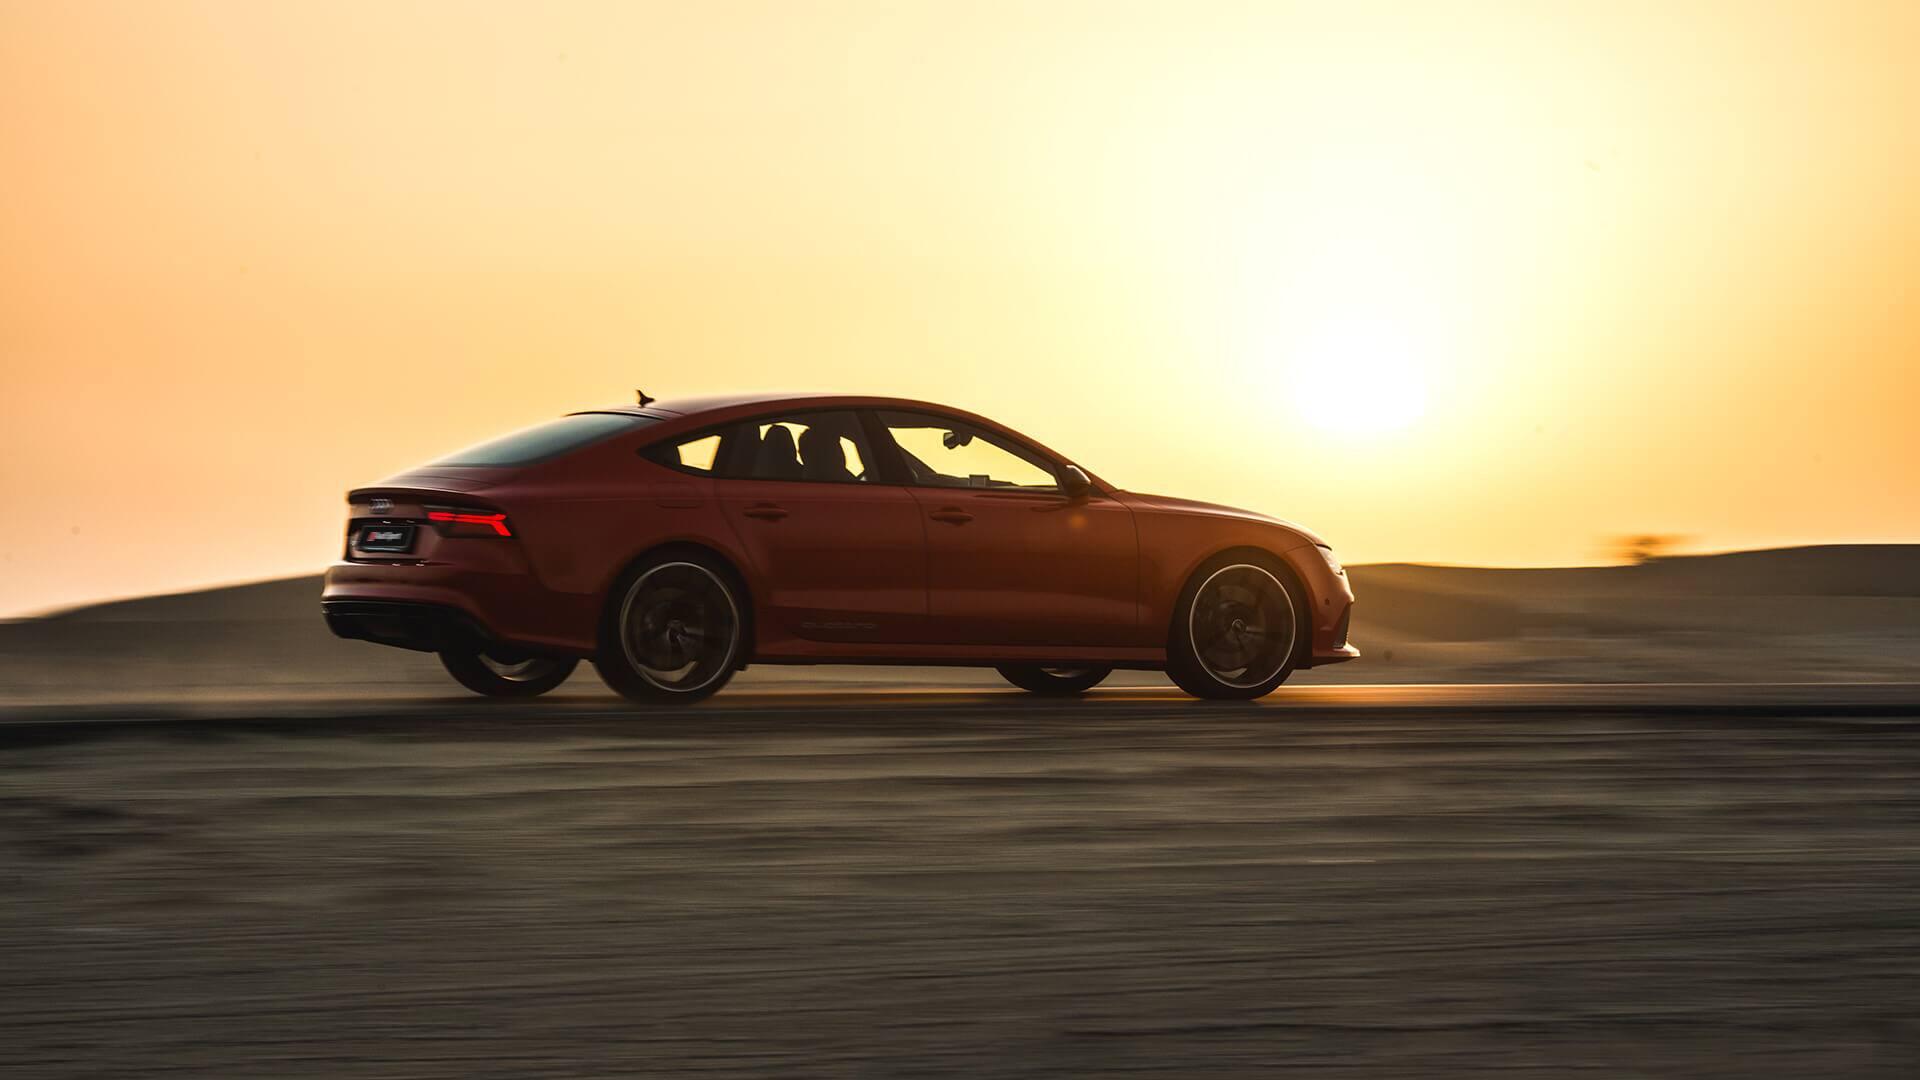 Audi Rs7 Performance A7 Audi Middle East Advancement Through